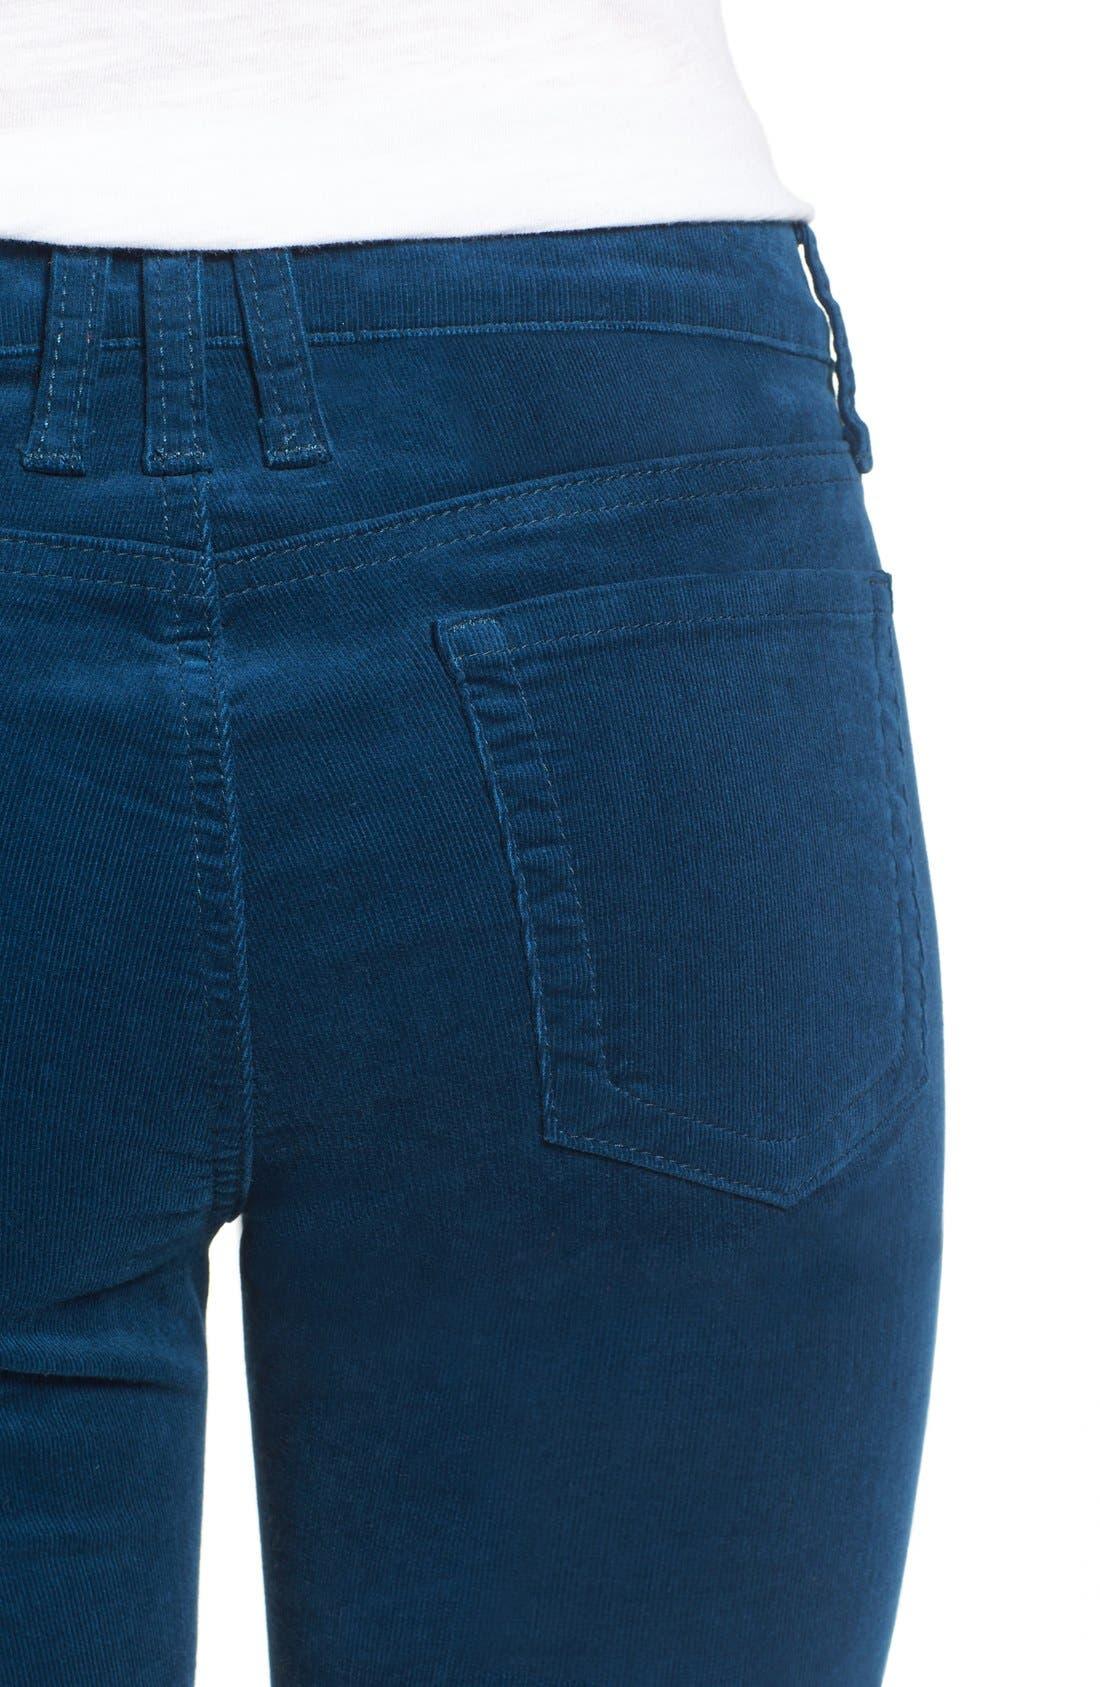 'Diana' Stretch Corduroy Skinny Pants,                             Alternate thumbnail 133, color,